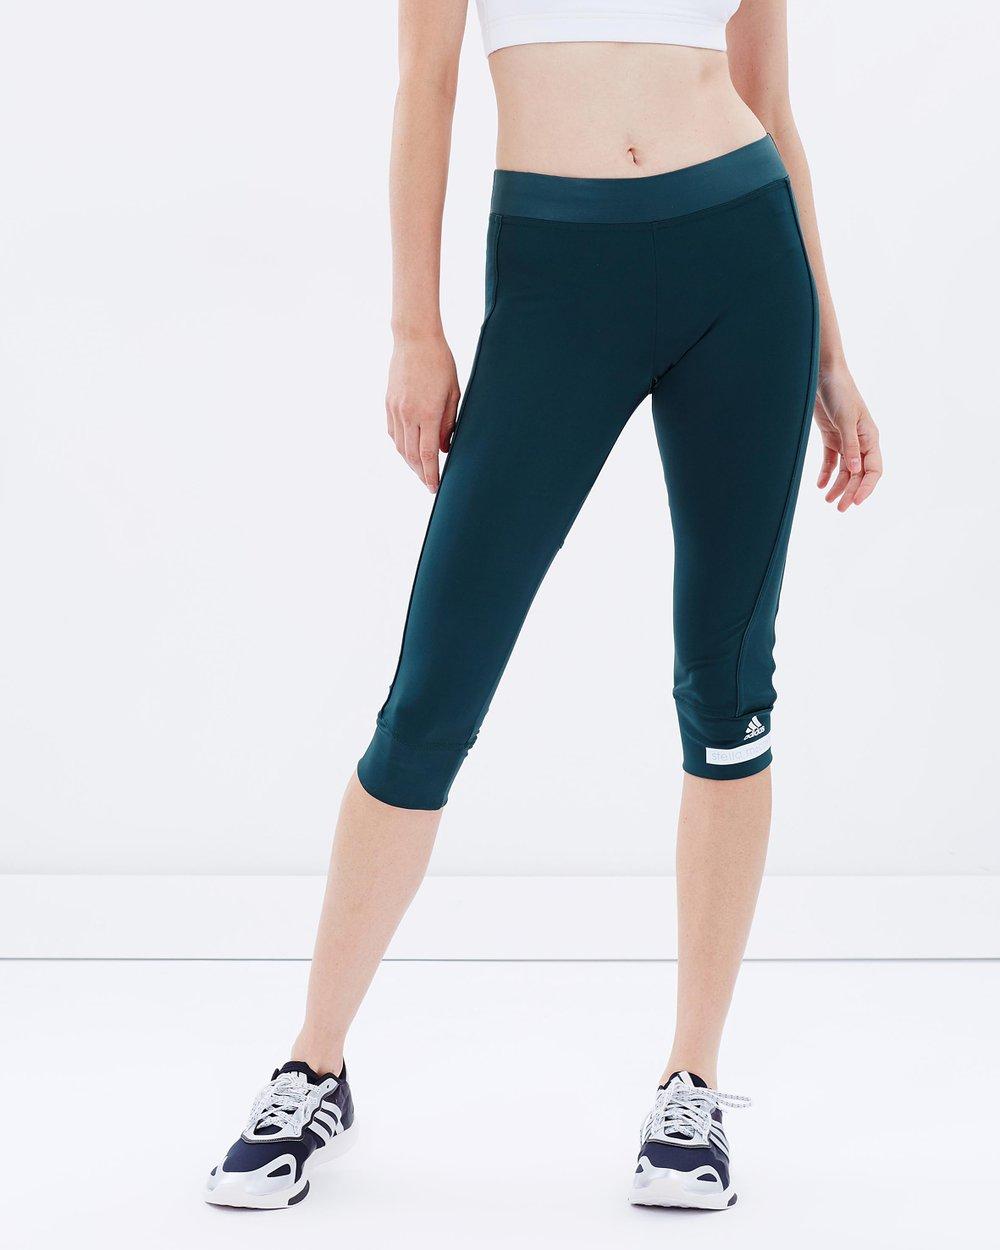 060dcdb02d8a4 Adidas Alphaskin Capri Legging In Gray | 2019 trends | xoosha